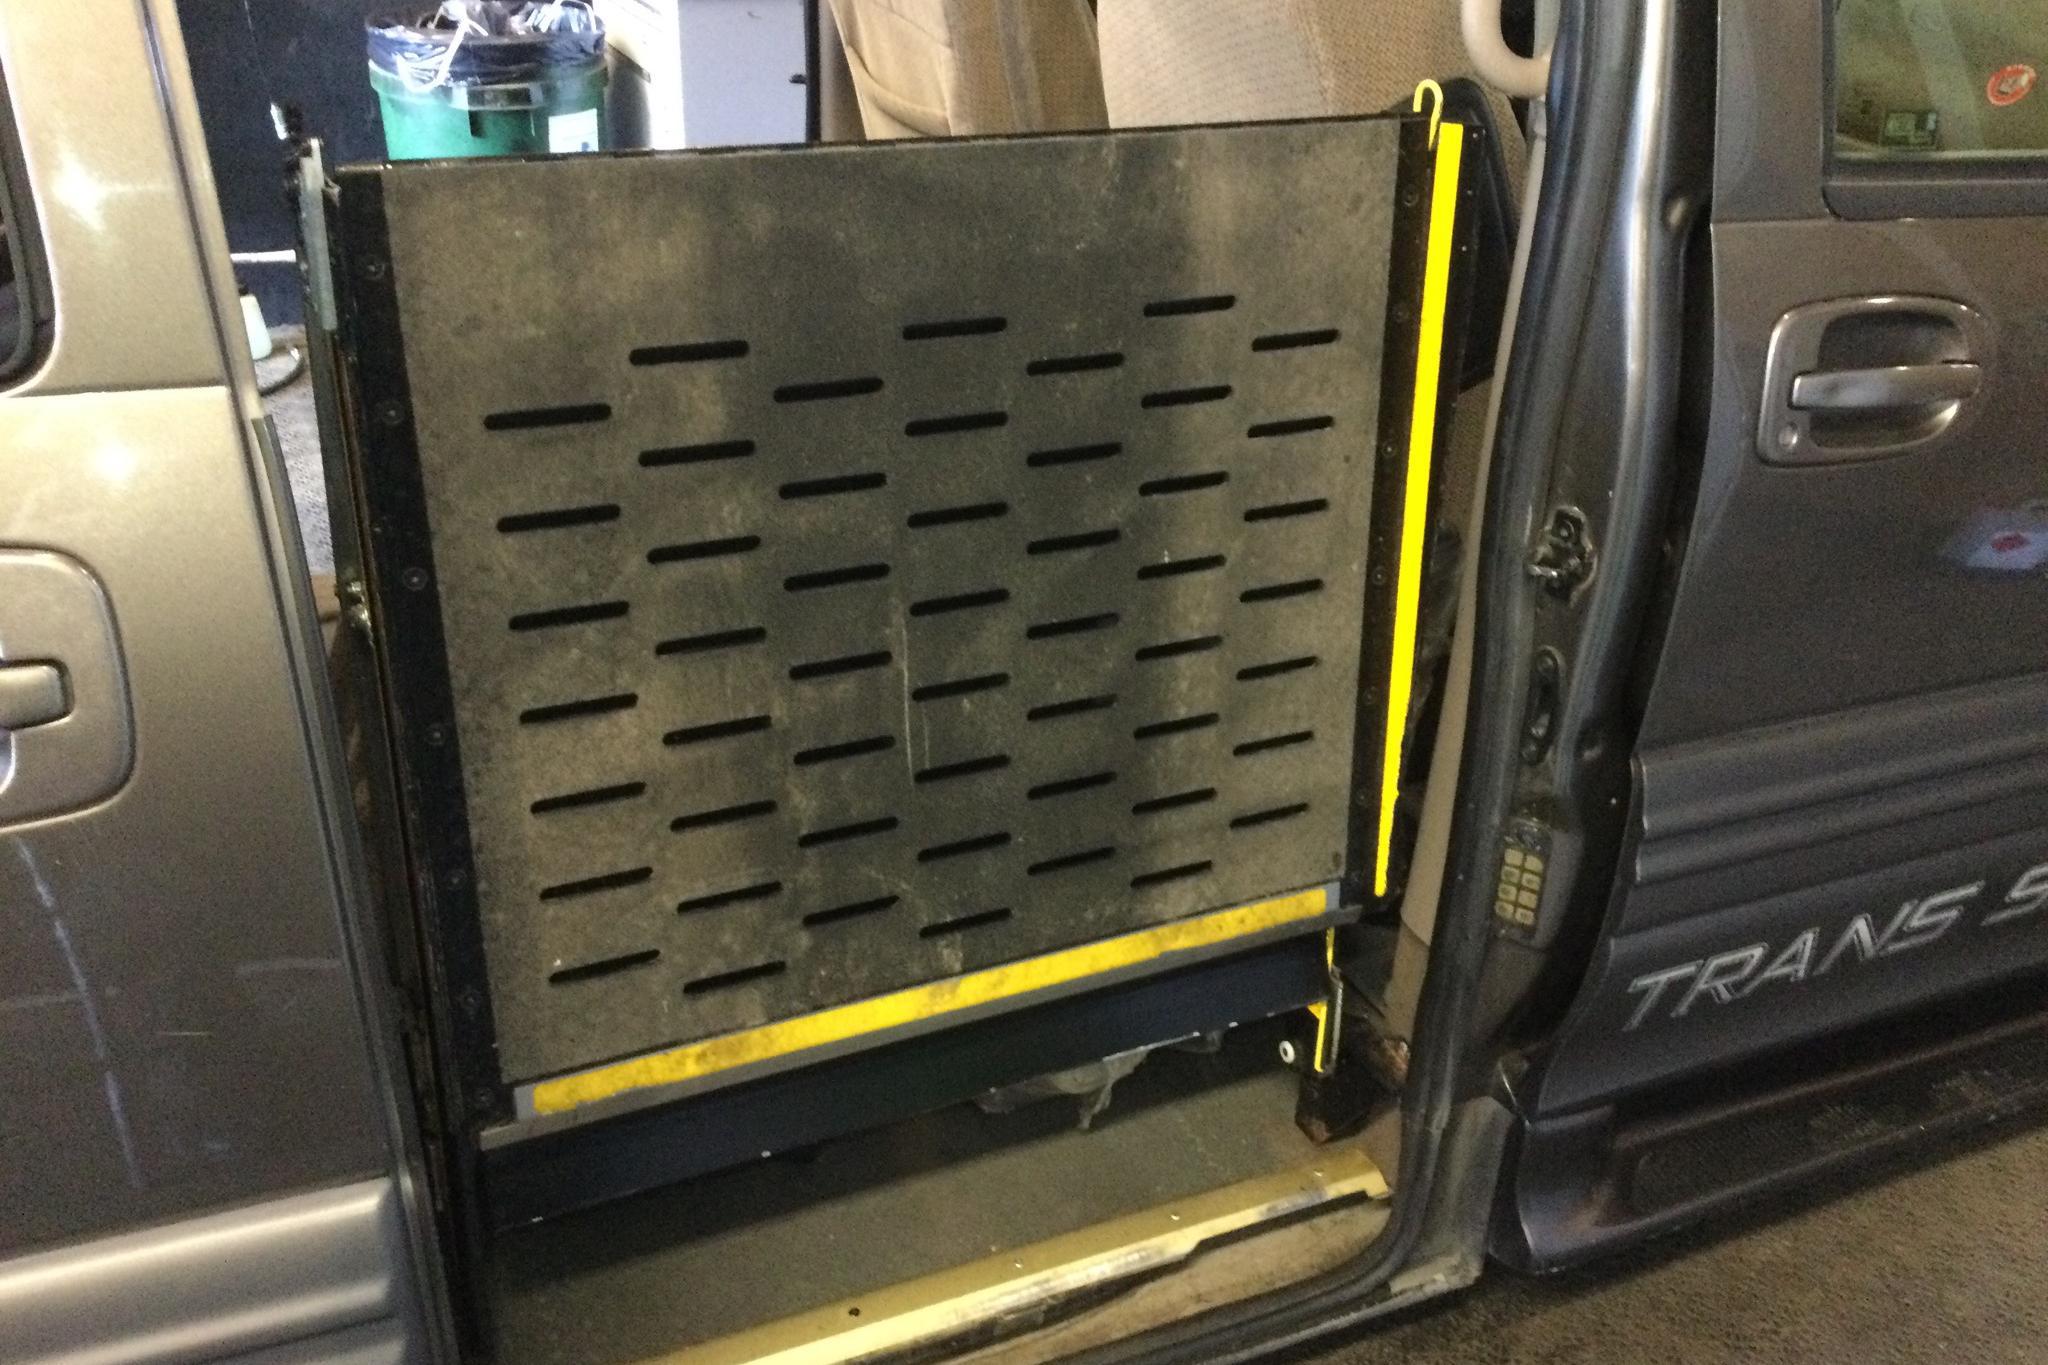 Chevrolet Trans Sport 3.4 V6 (188hk) - 4 700 mil - Automat - brun - 2002